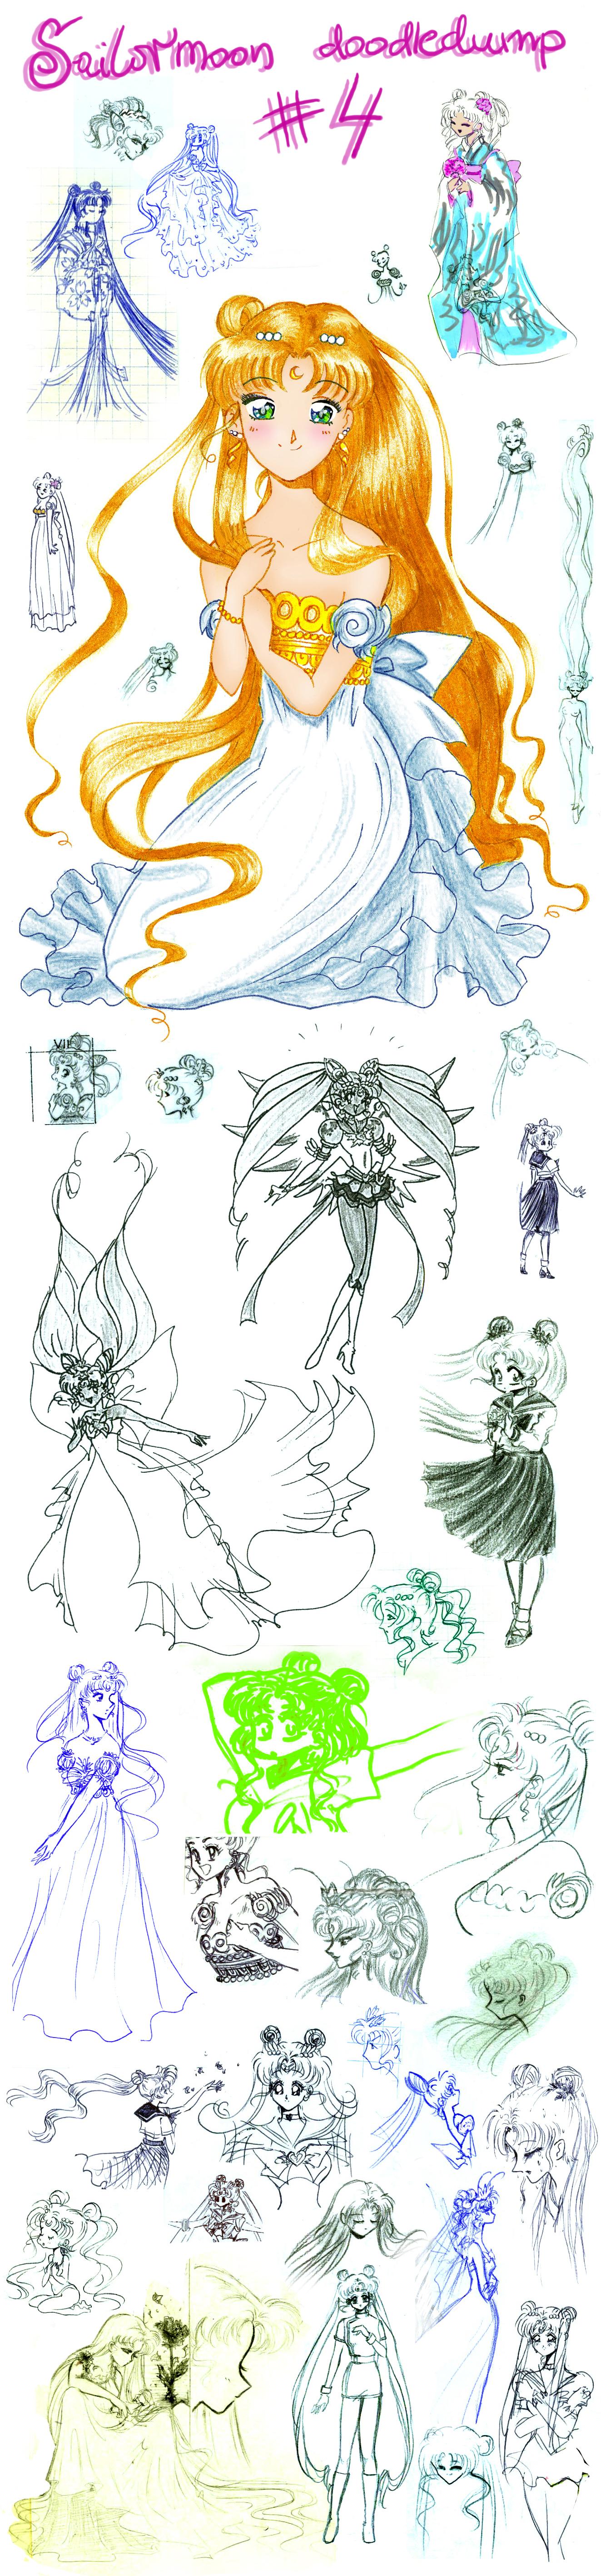 Sailormoon doodledump 4 by NitroFieja